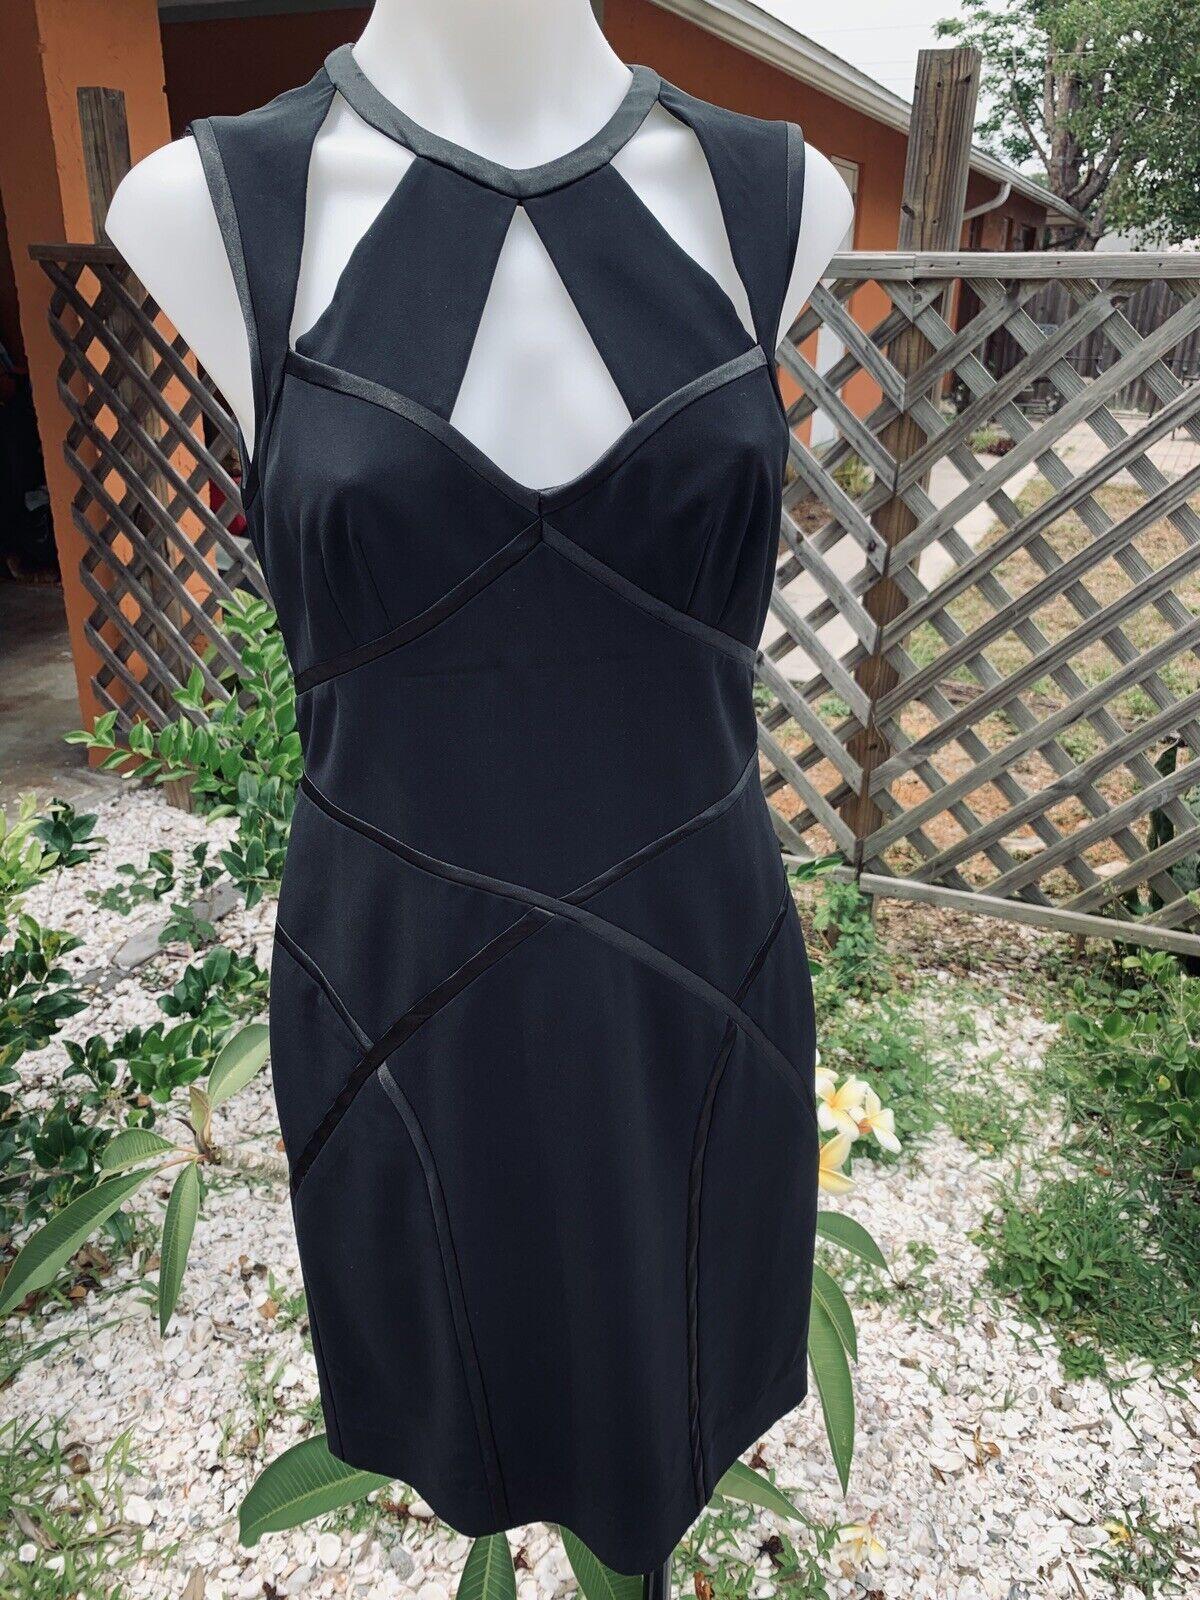 Nicole Miller Bandage schwarz dress Größe 4